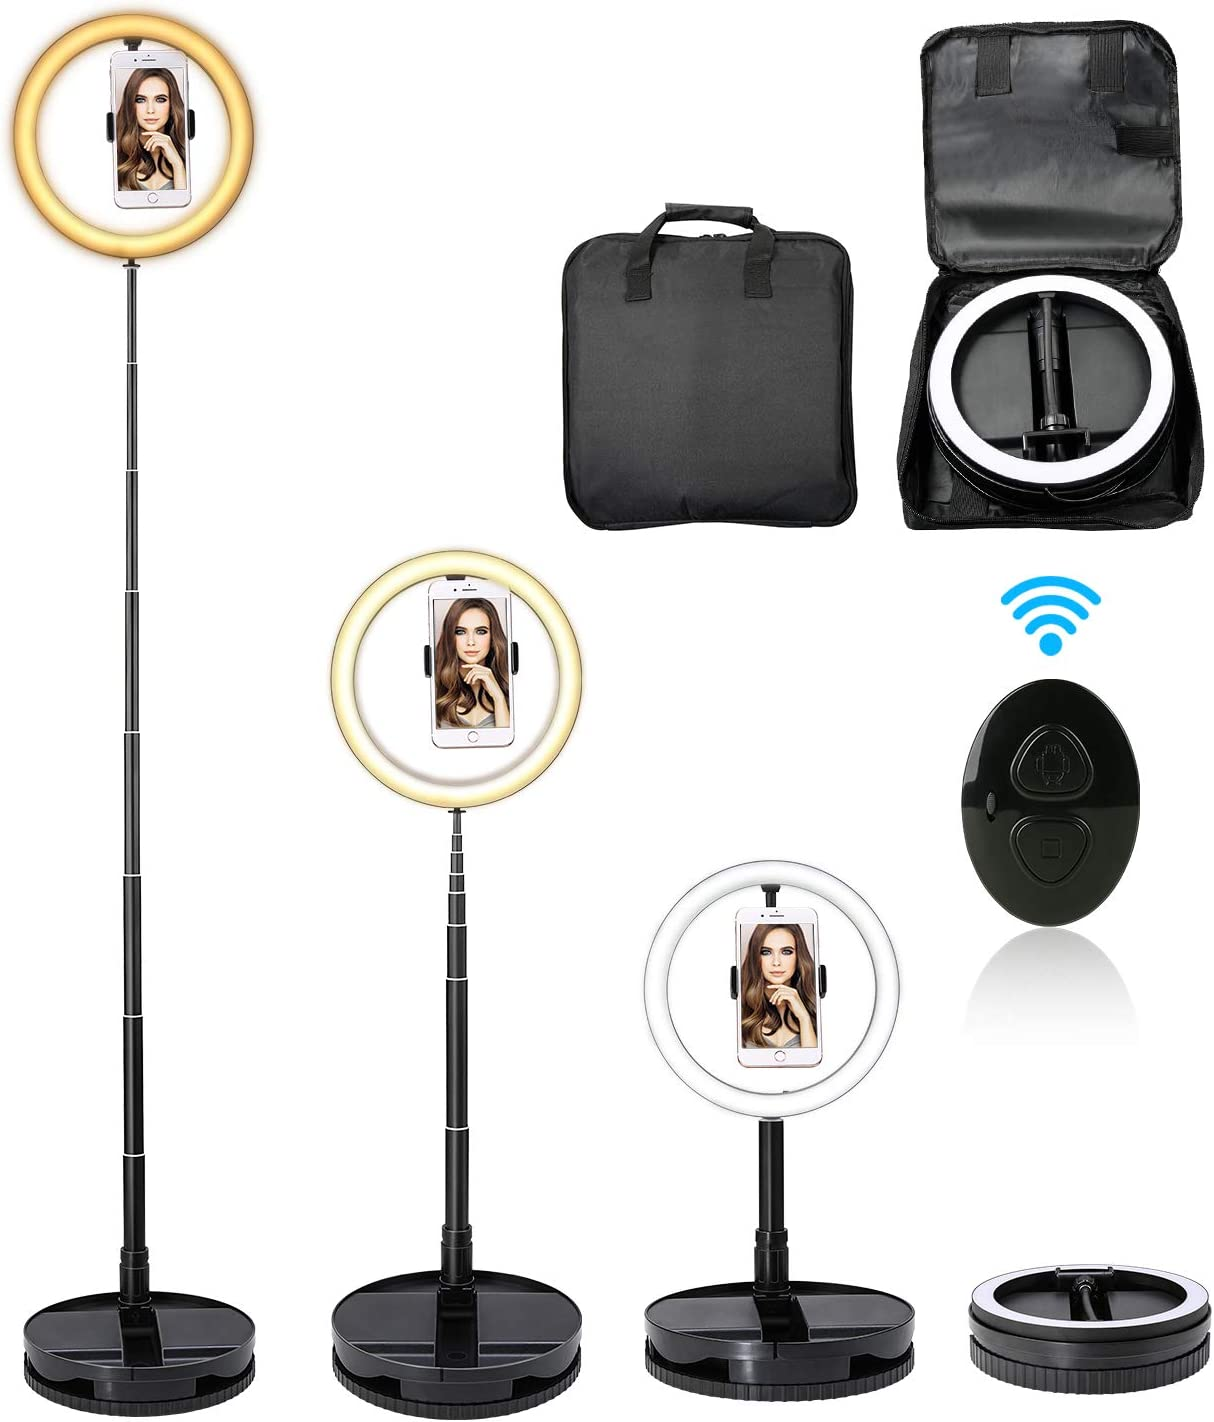 iEGrow Ring Light 18 Inches Pantalla T/áctil para C/ámara y Tel/éfono 2700K-5500K Anillo de Luz con Tripode y Bolsa de Viaje Aro de Luz para Movil Fotografia Youtube Maquillaje